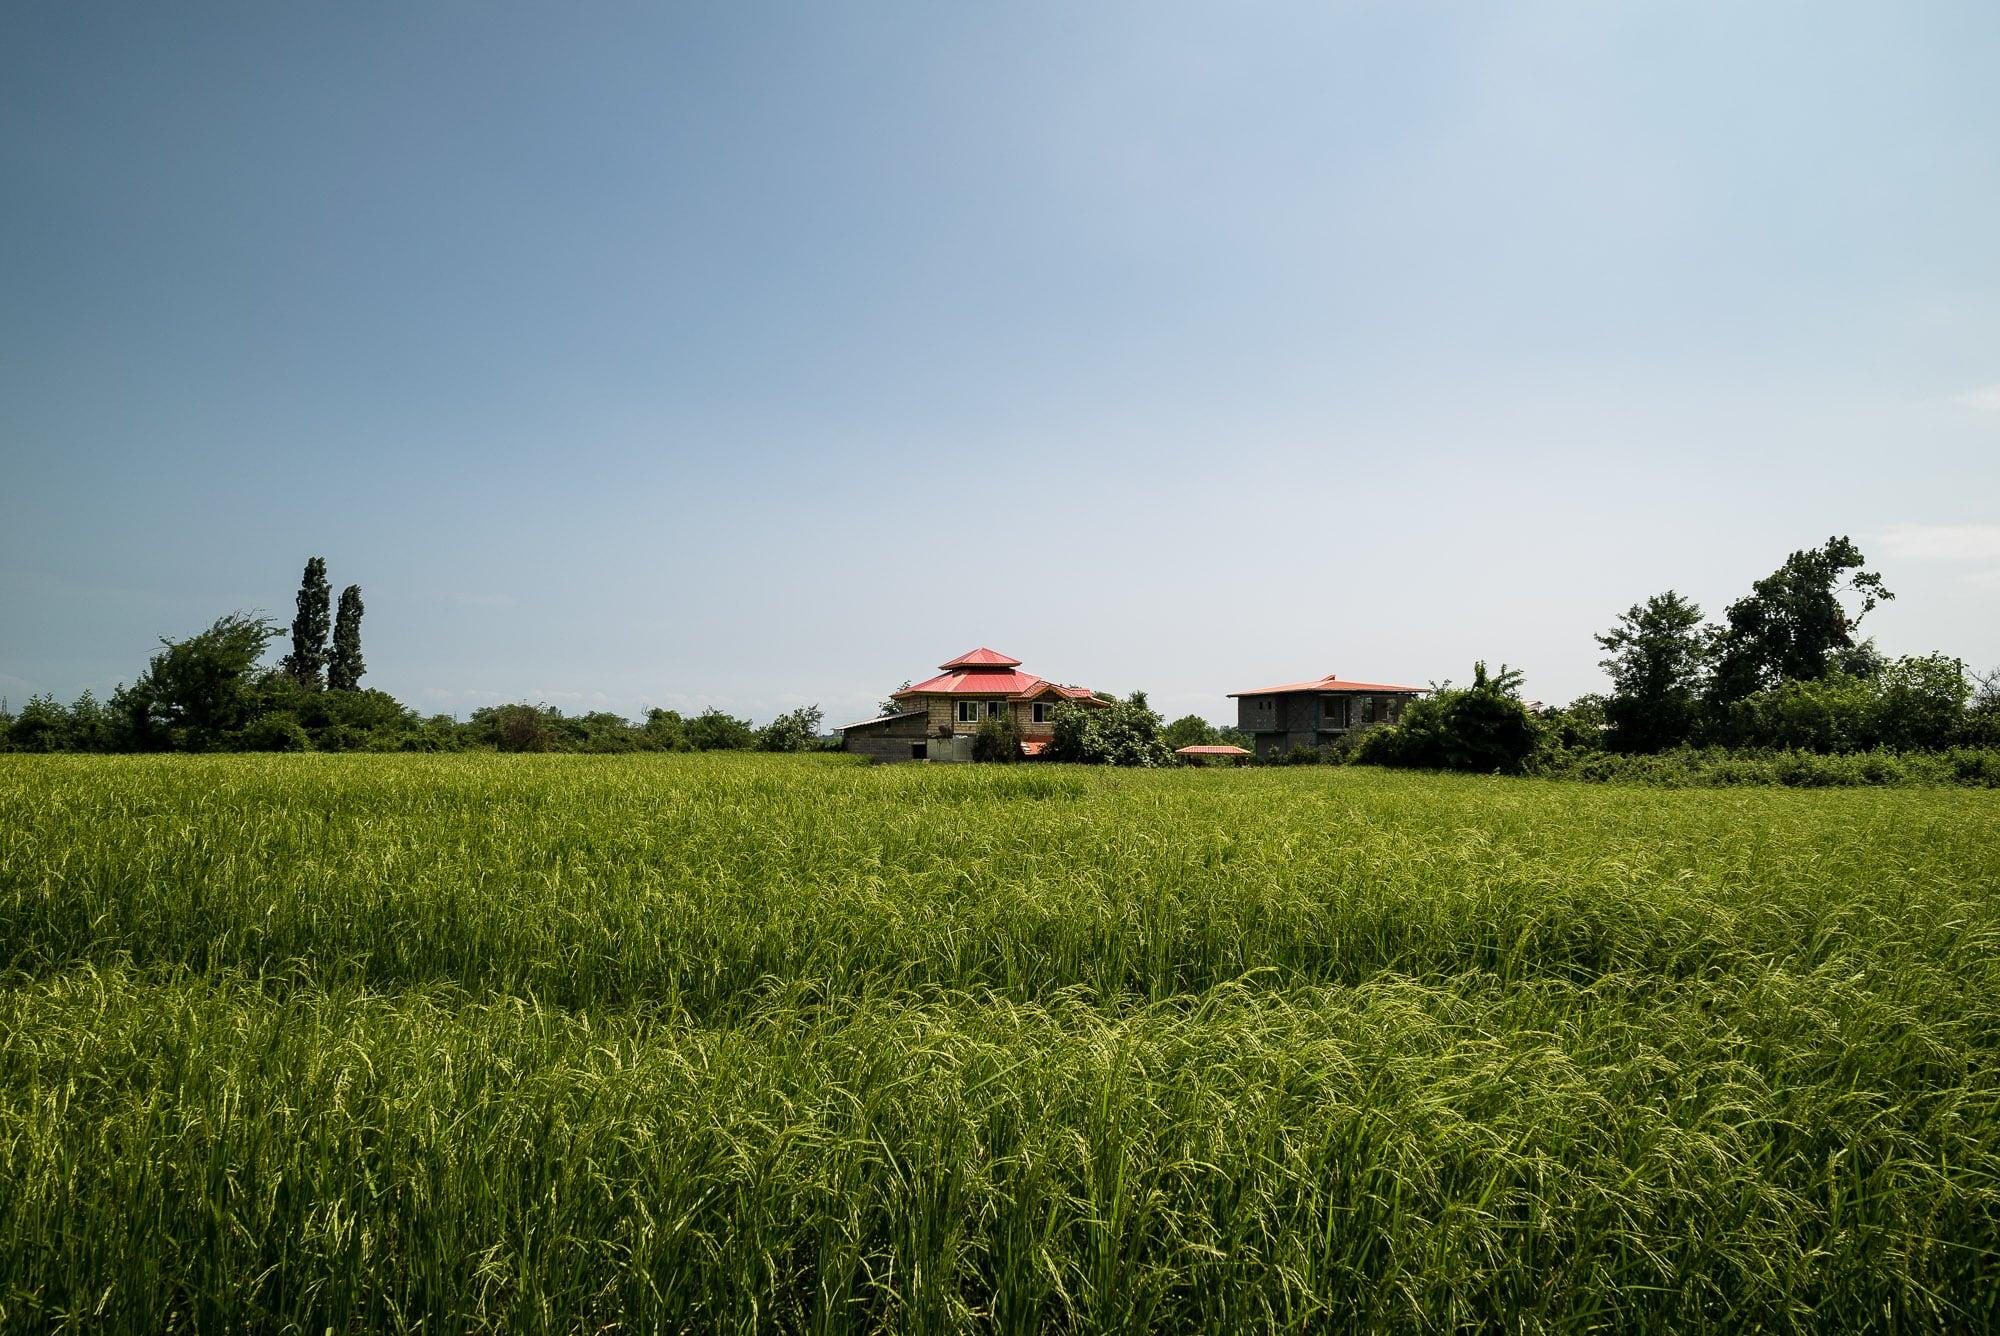 rice paddies and house